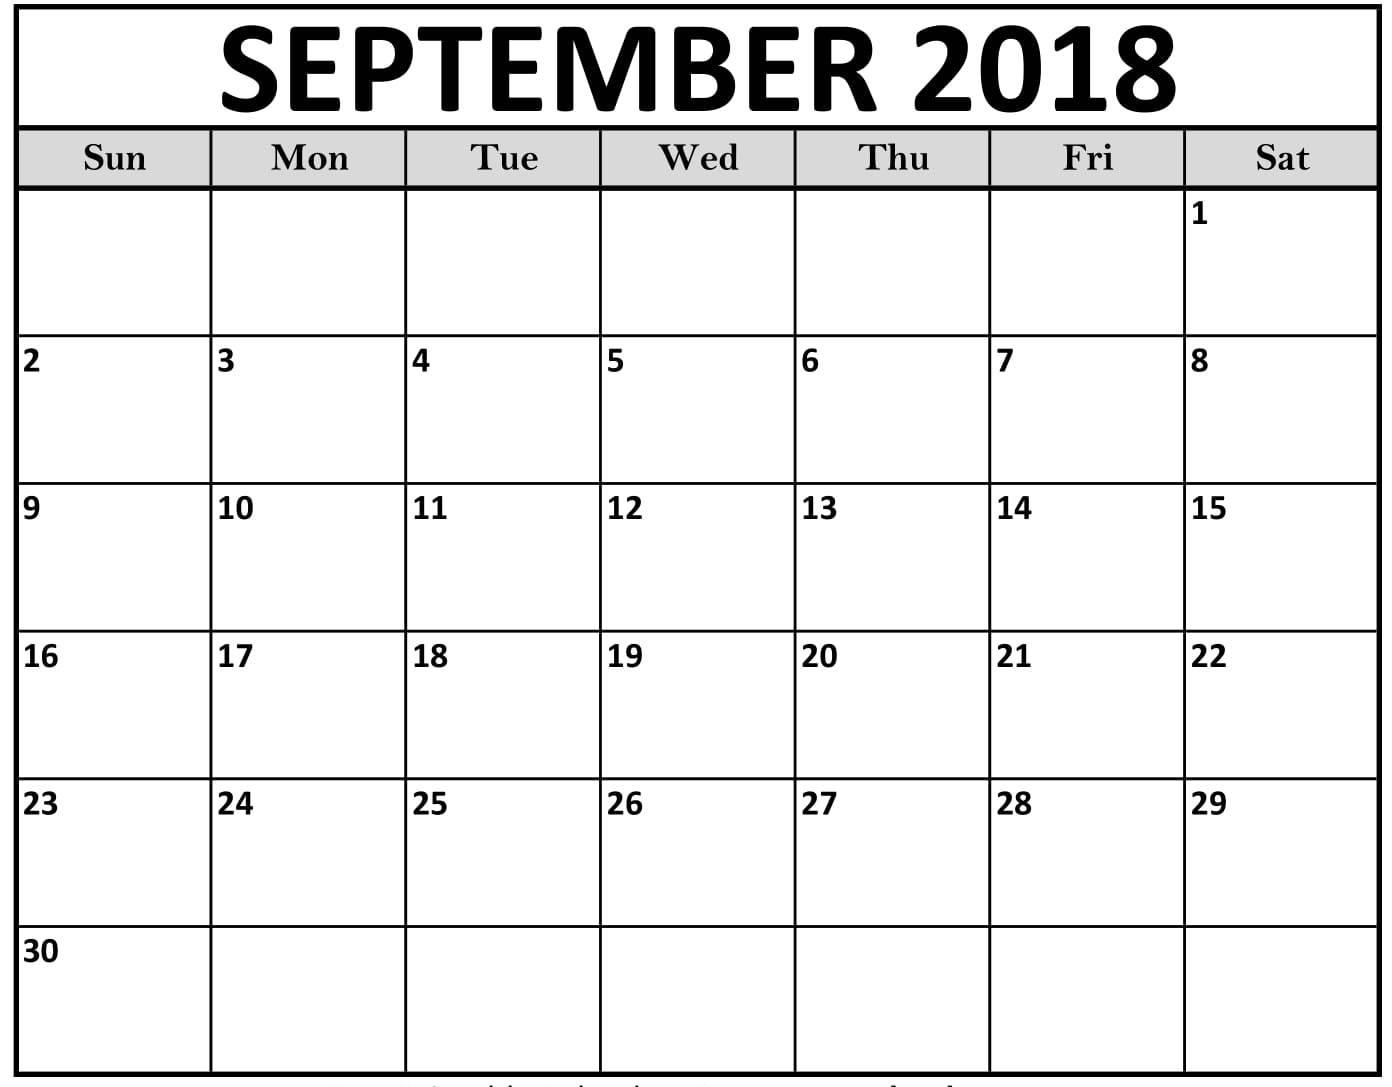 Printable September 2018 Calendar   Hauck Mansion intended for Free Printable September Blank Calendars With Christian Themes